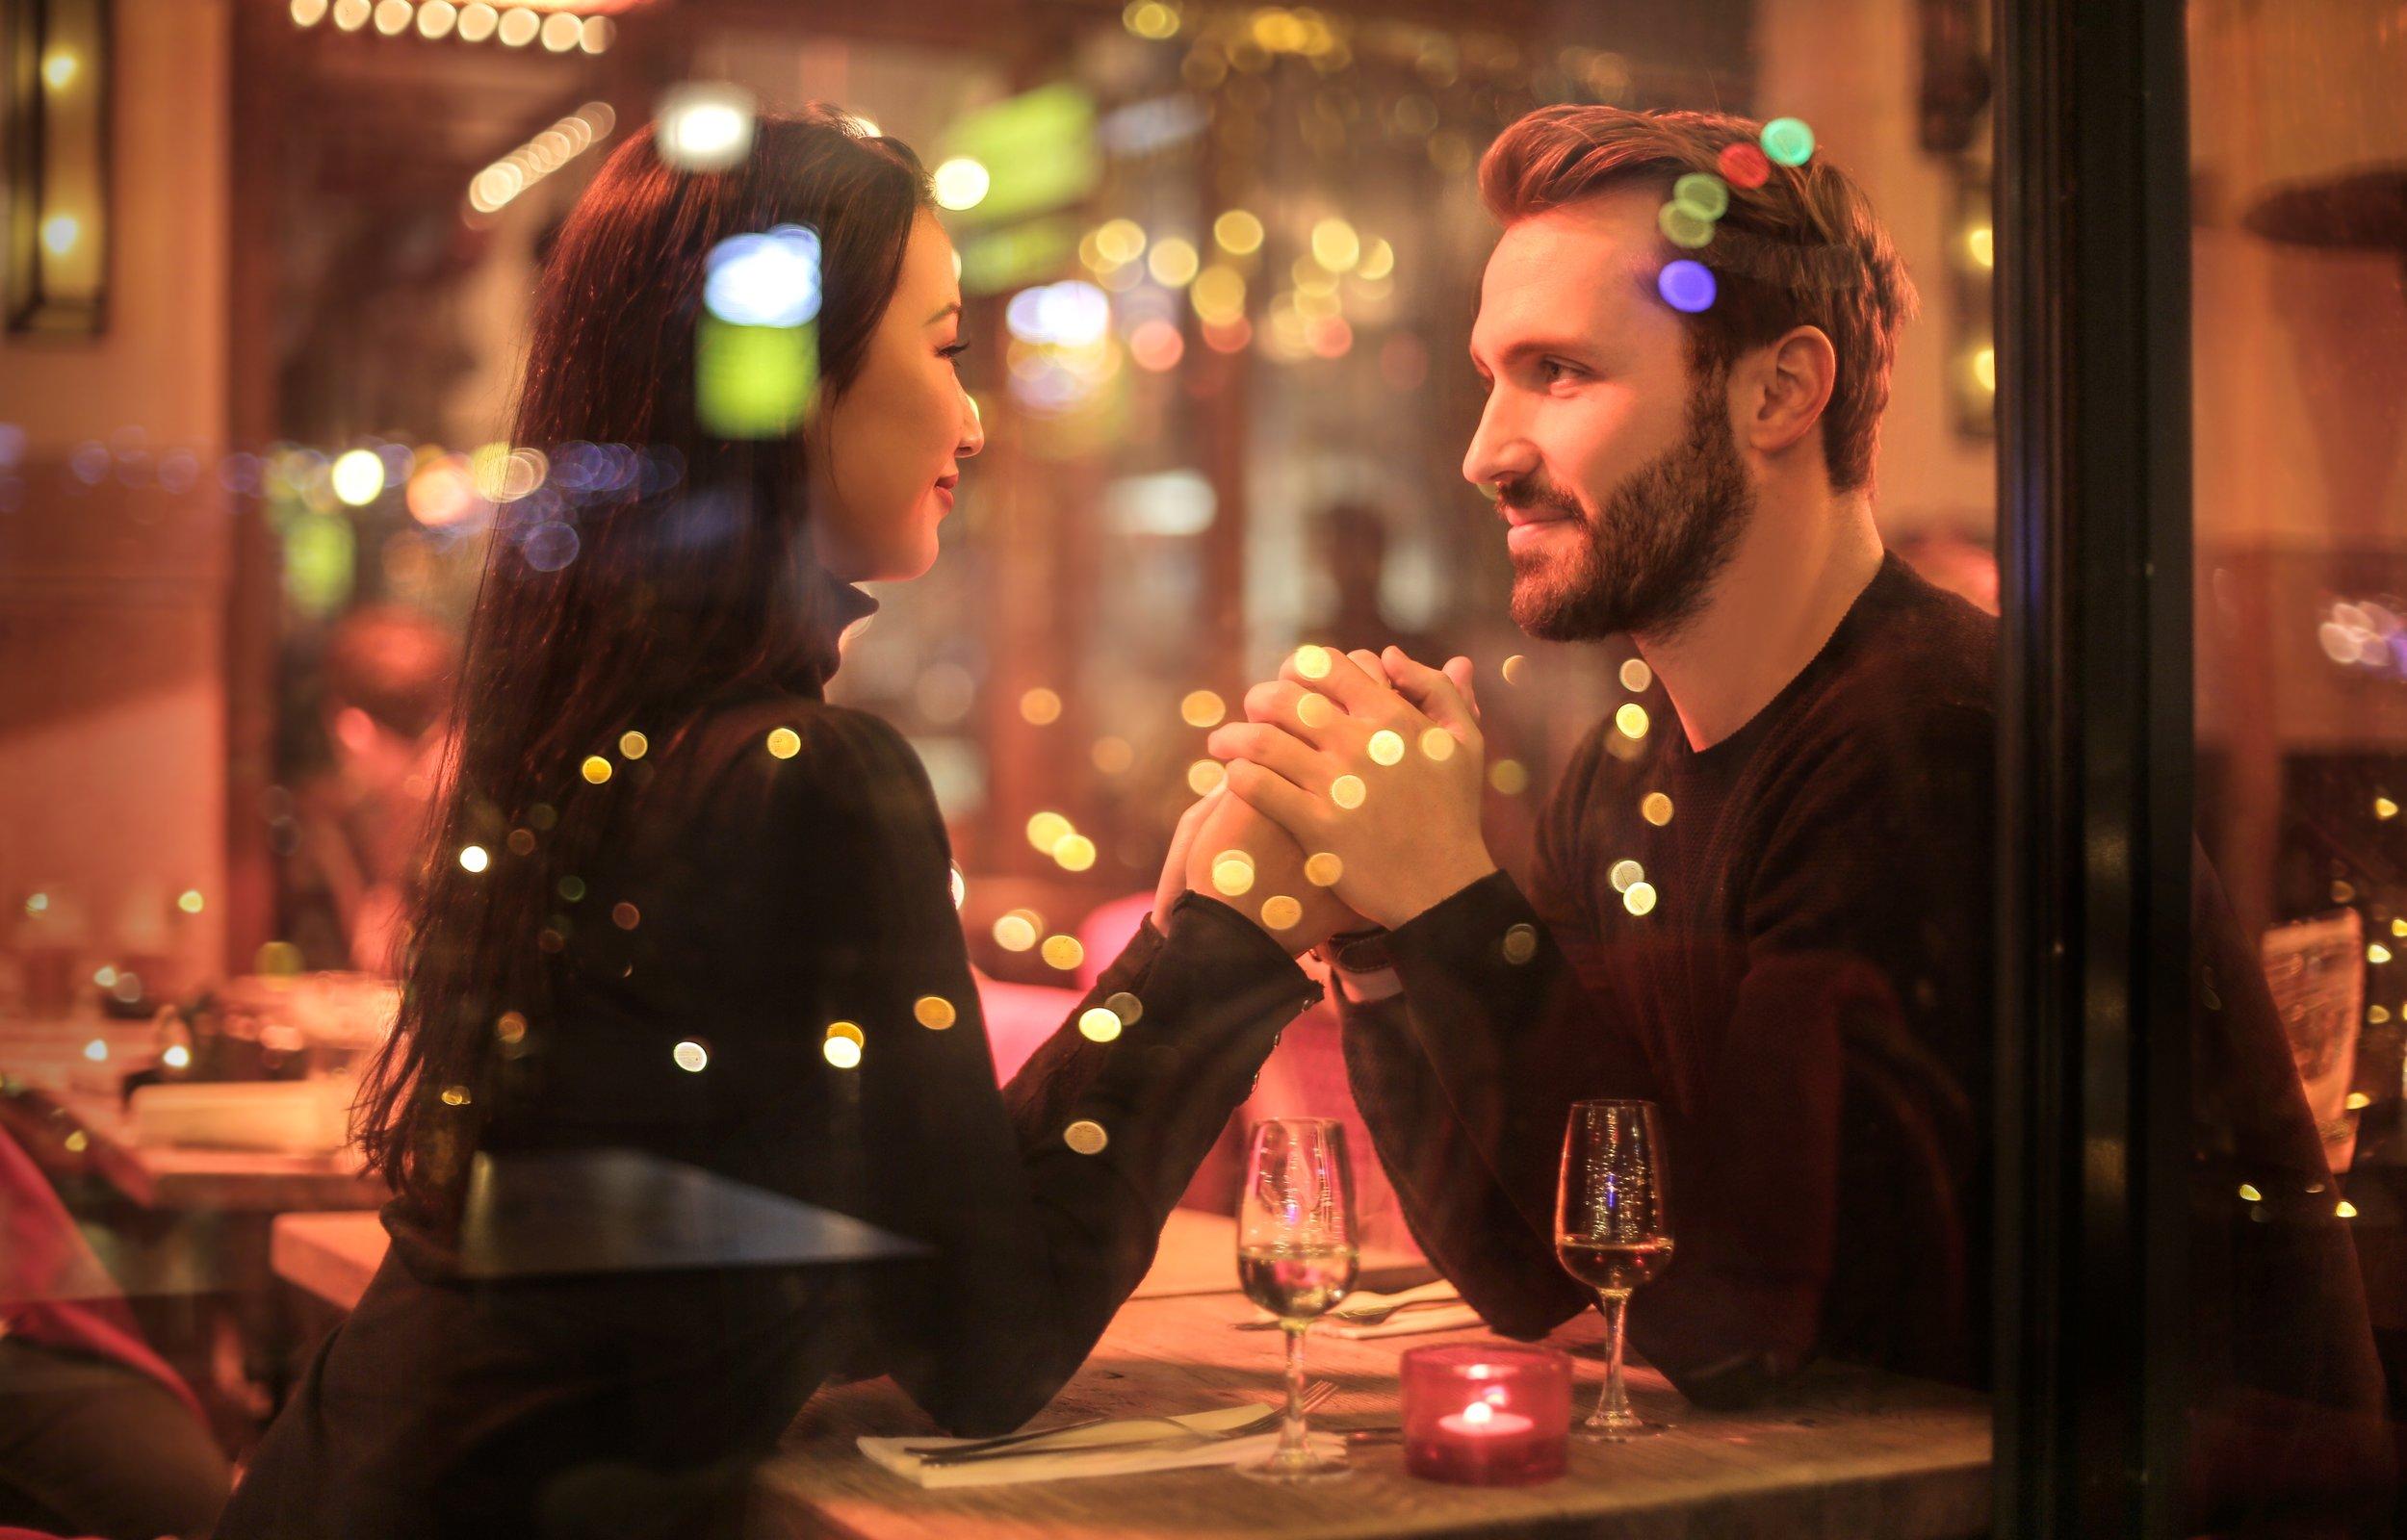 adult-beautiful-couple-842546.jpg